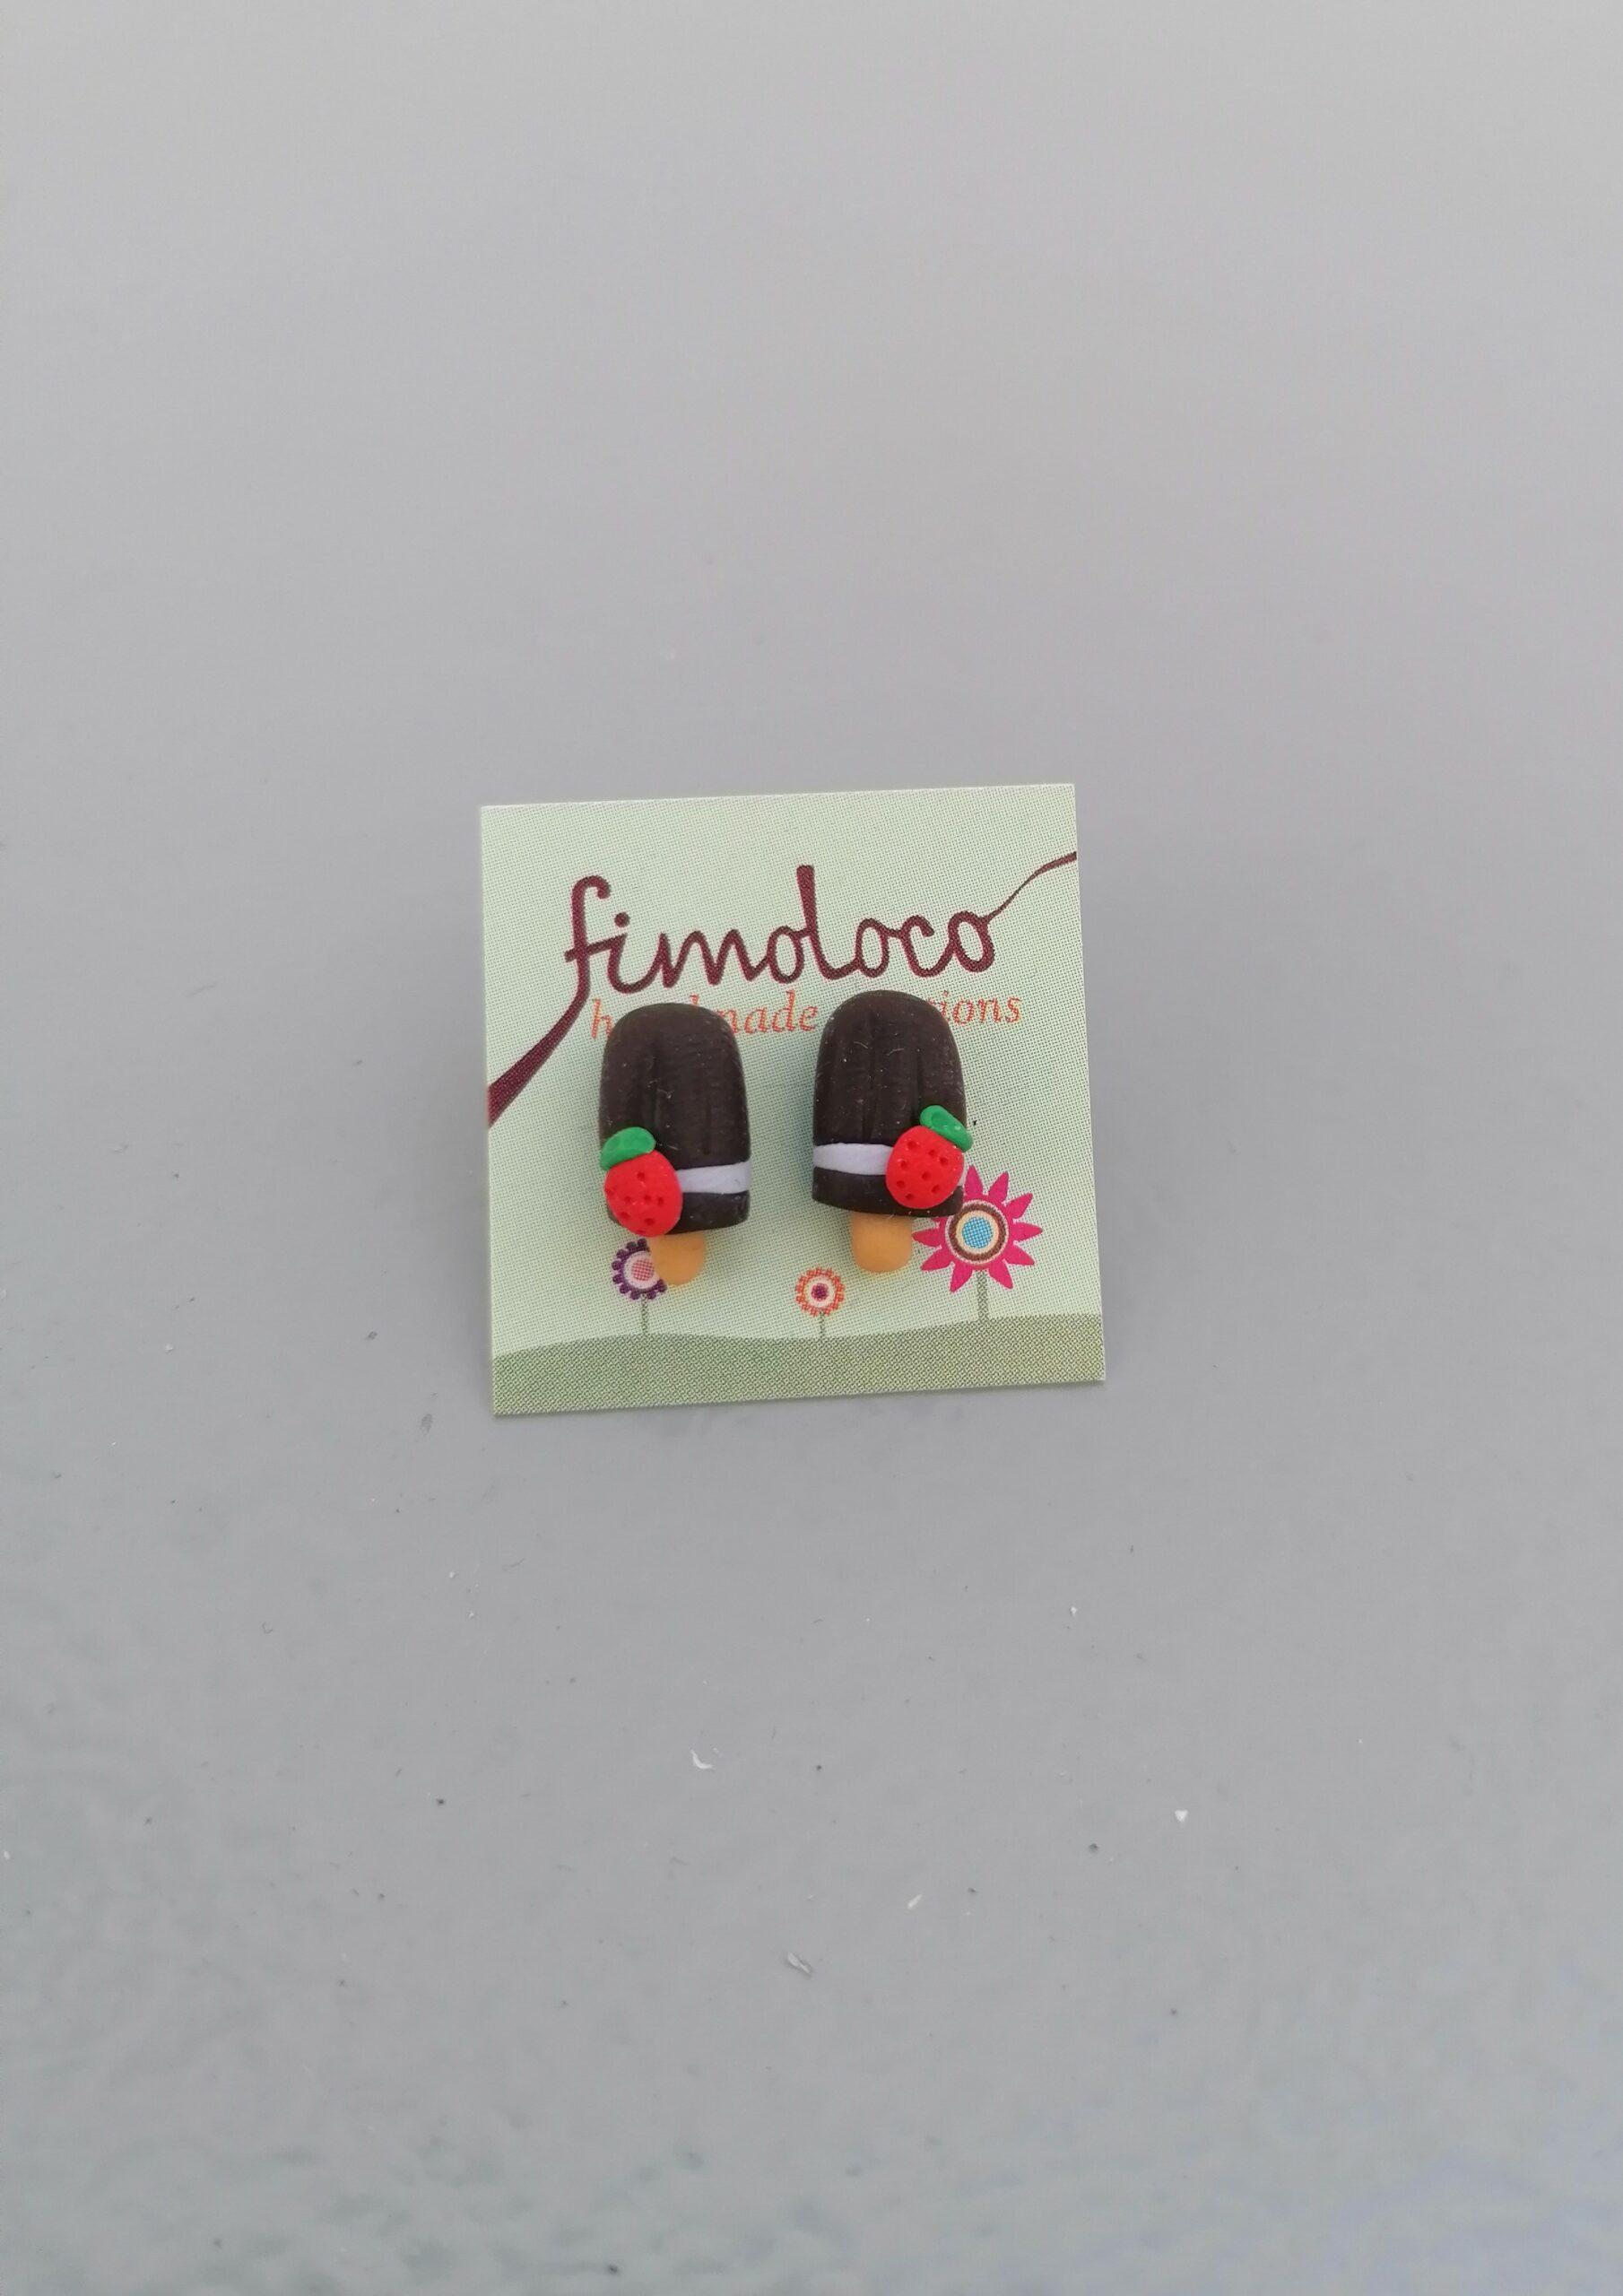 swlobeearicestickchokosrawberries1 1 scaled